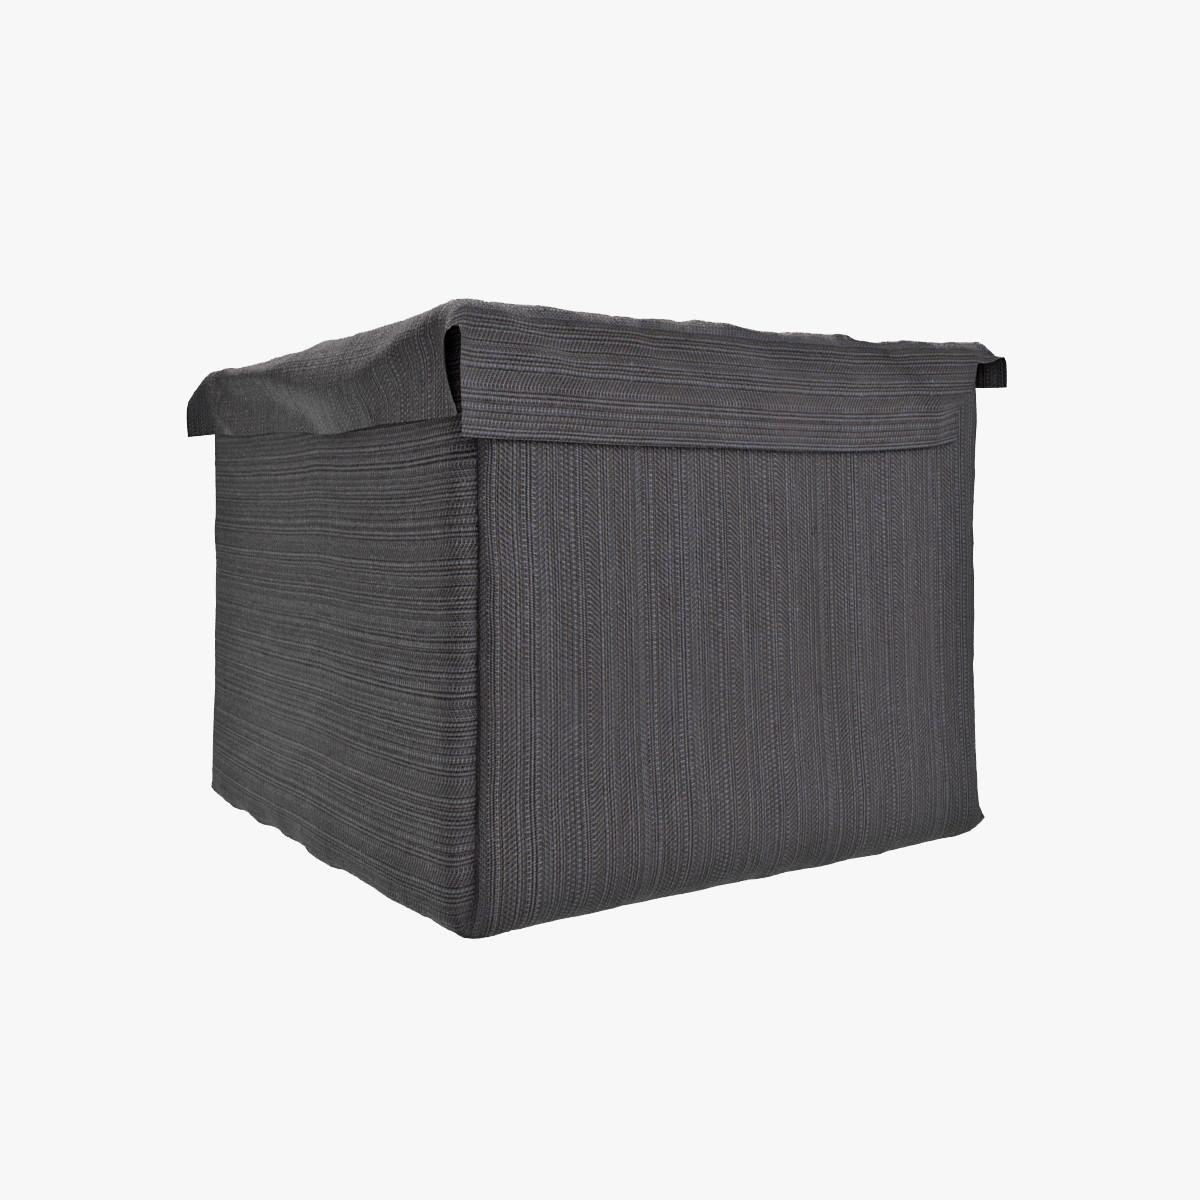 cloth_storage _box-00.jpg